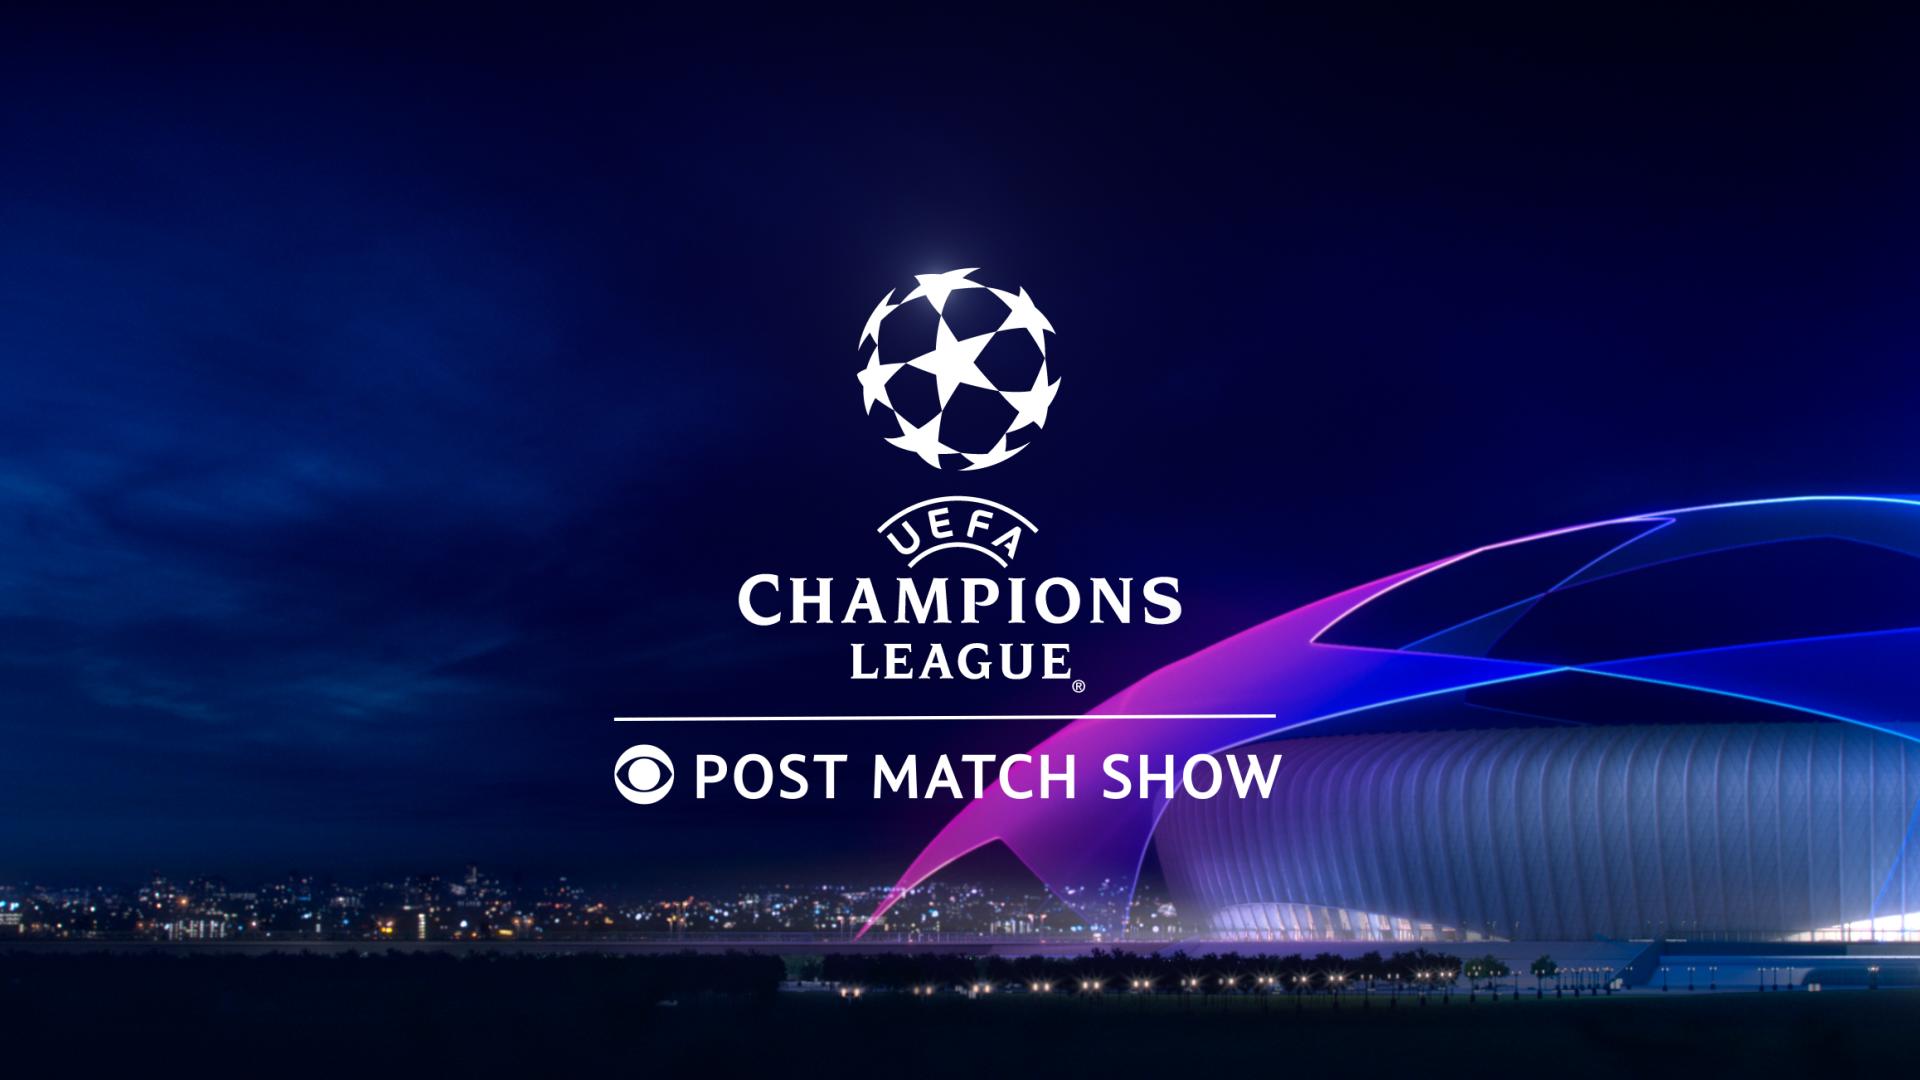 uefa-button-postmatch-v2-248